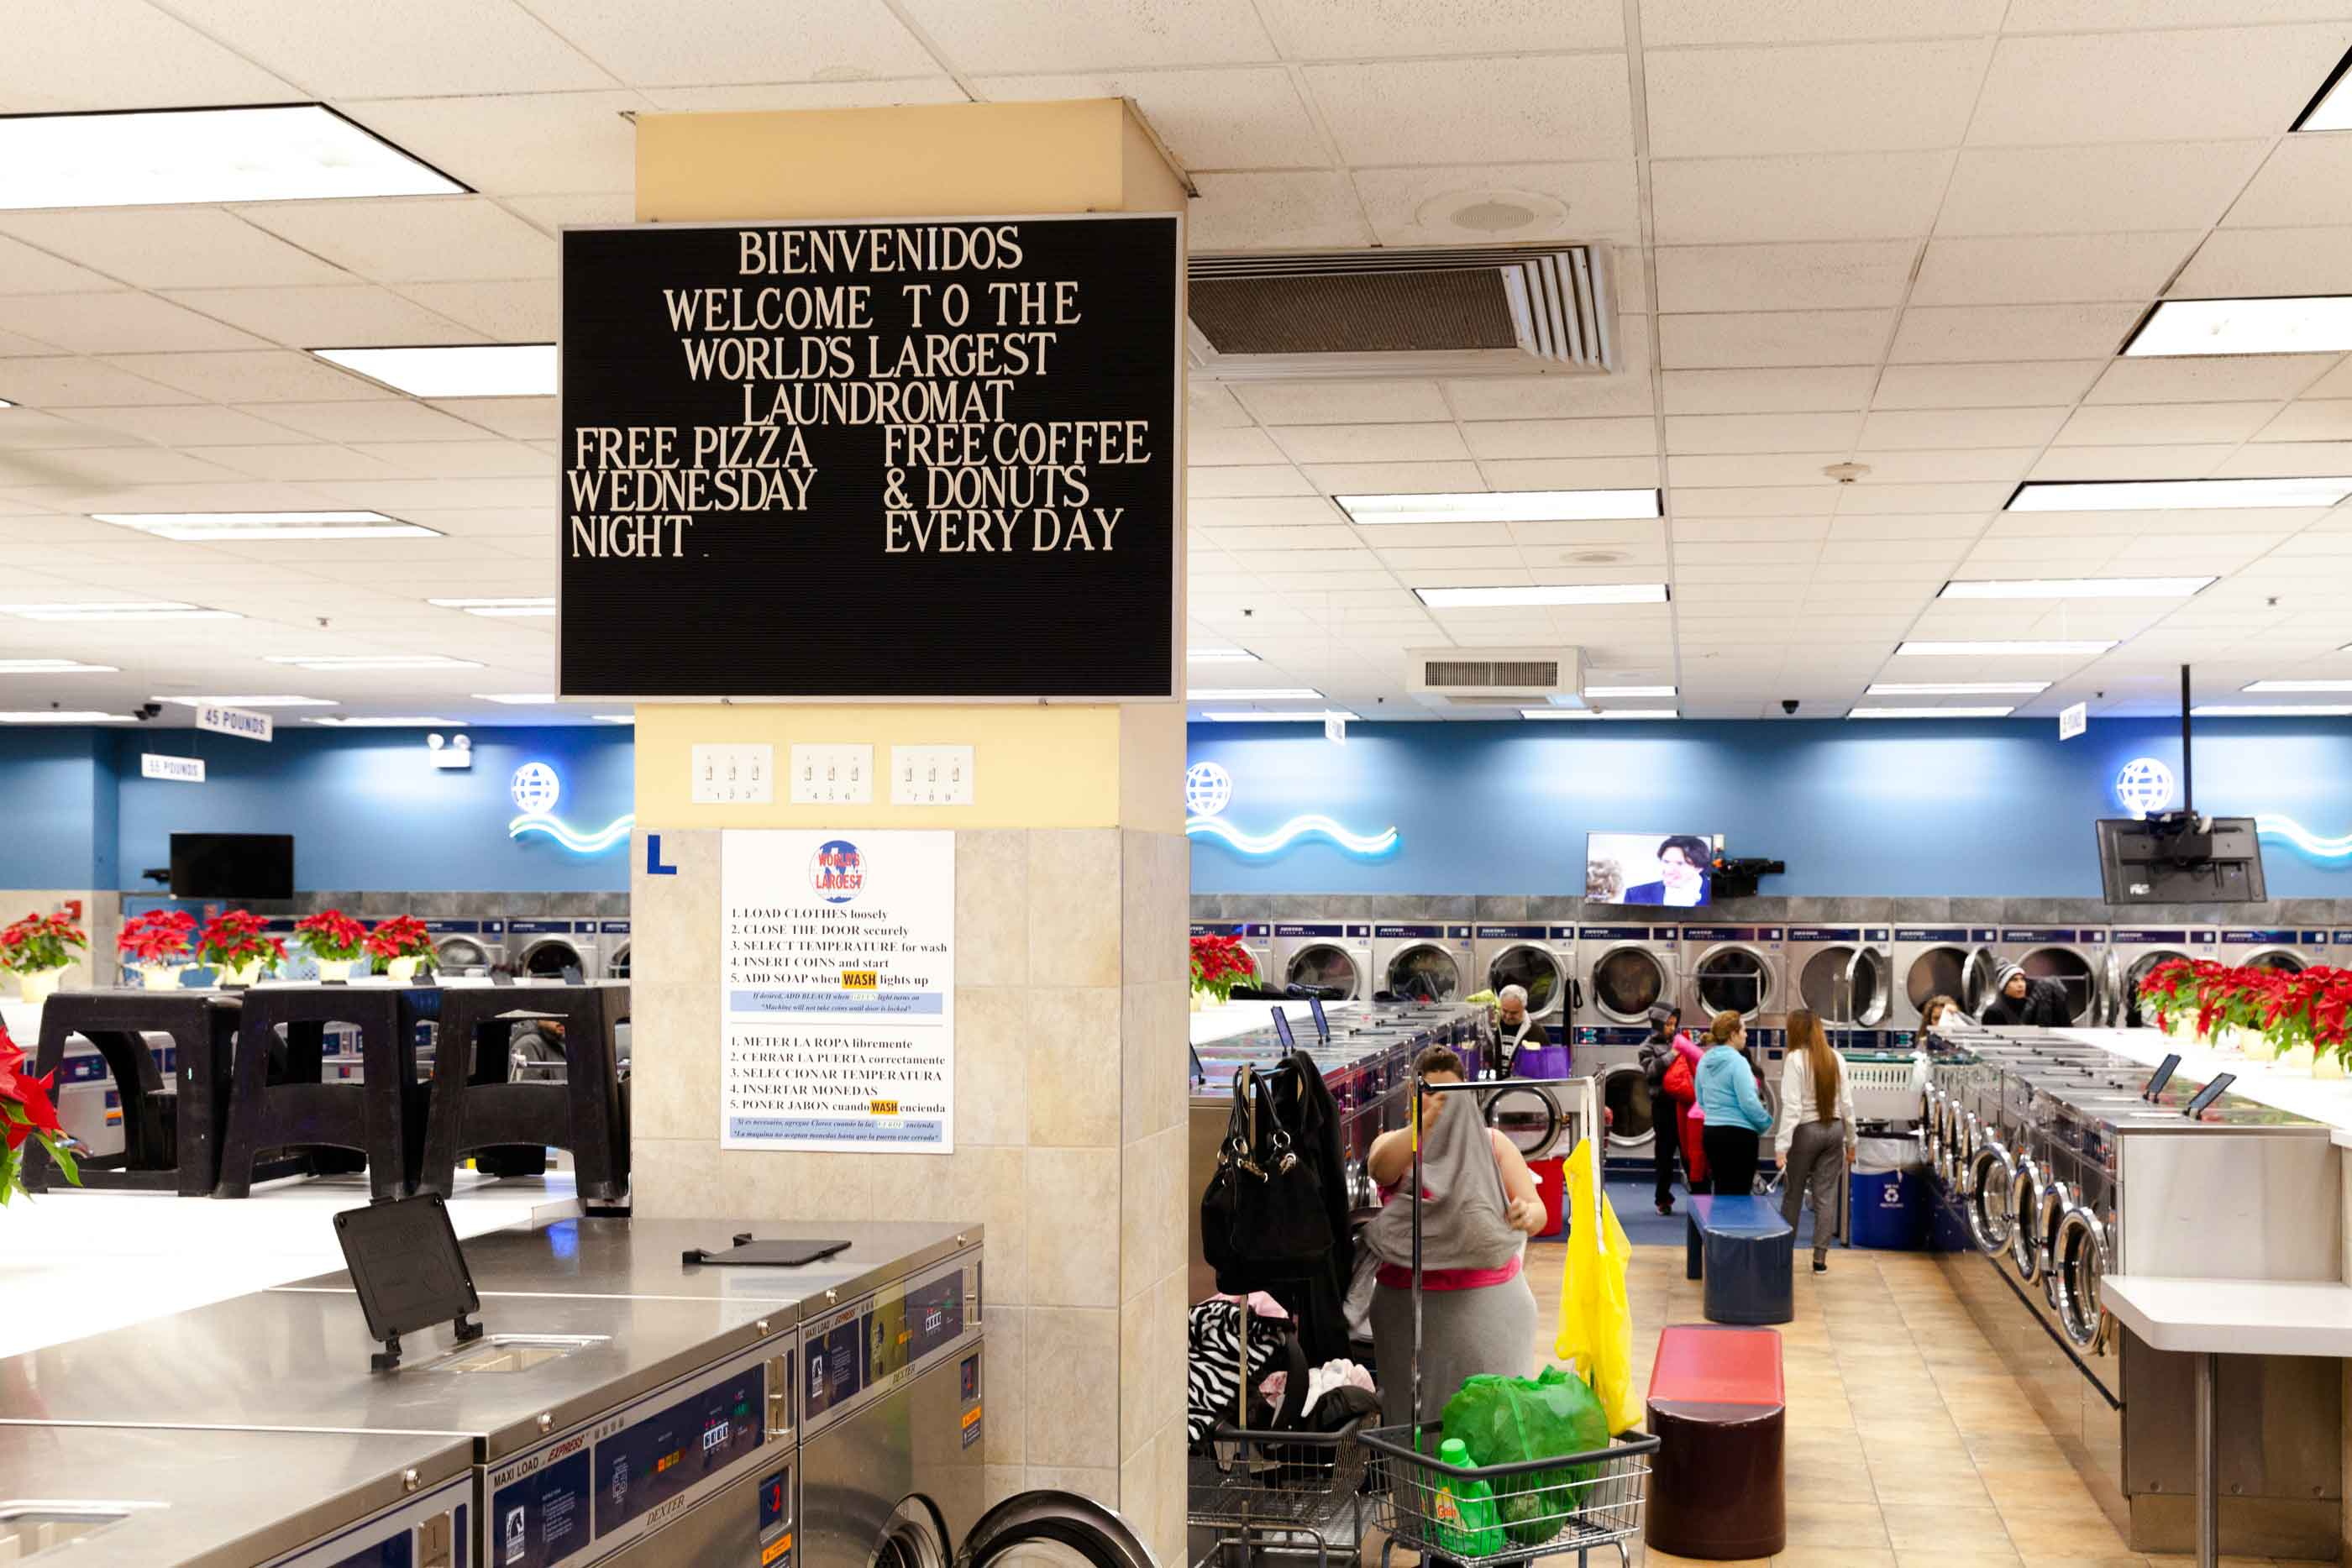 2800-Laundromat-43